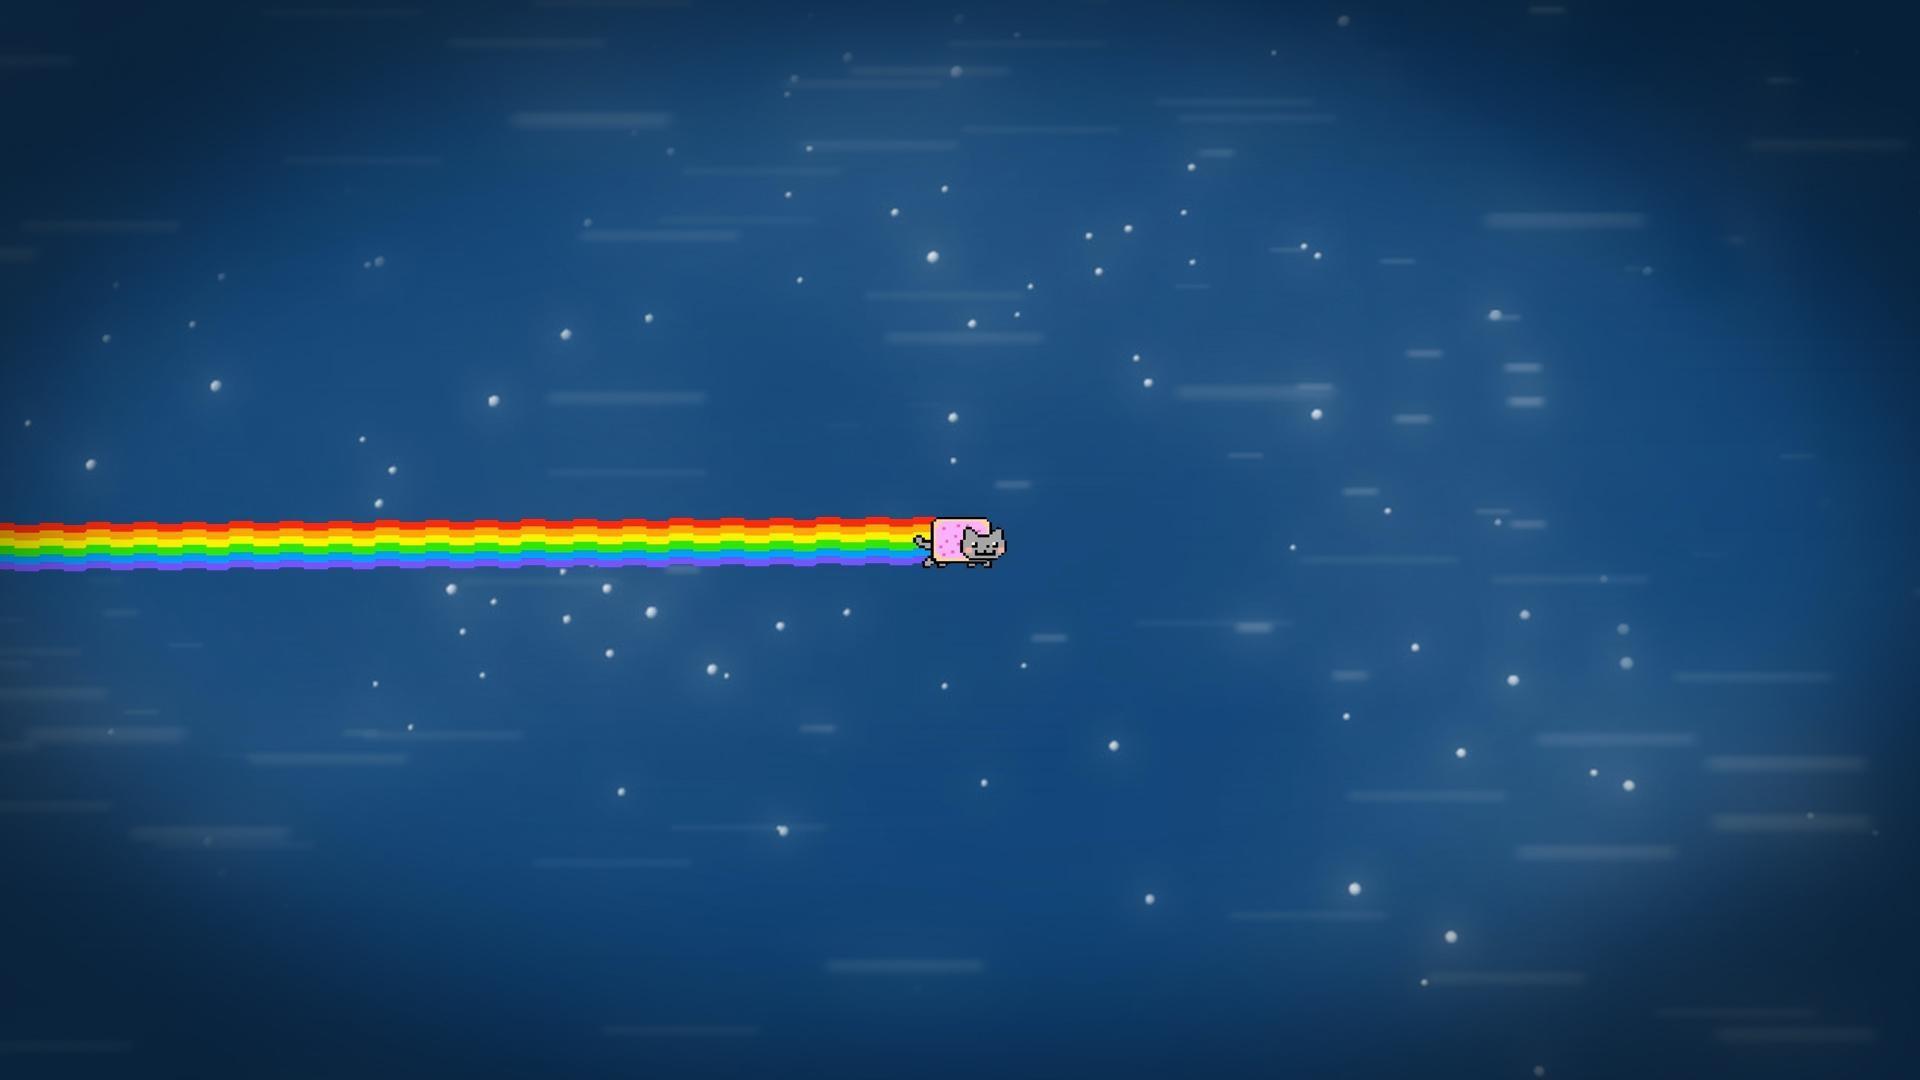 Troll Face Wallpaper Iphone Nyan Cat Iphone Wallpaper 64 Images